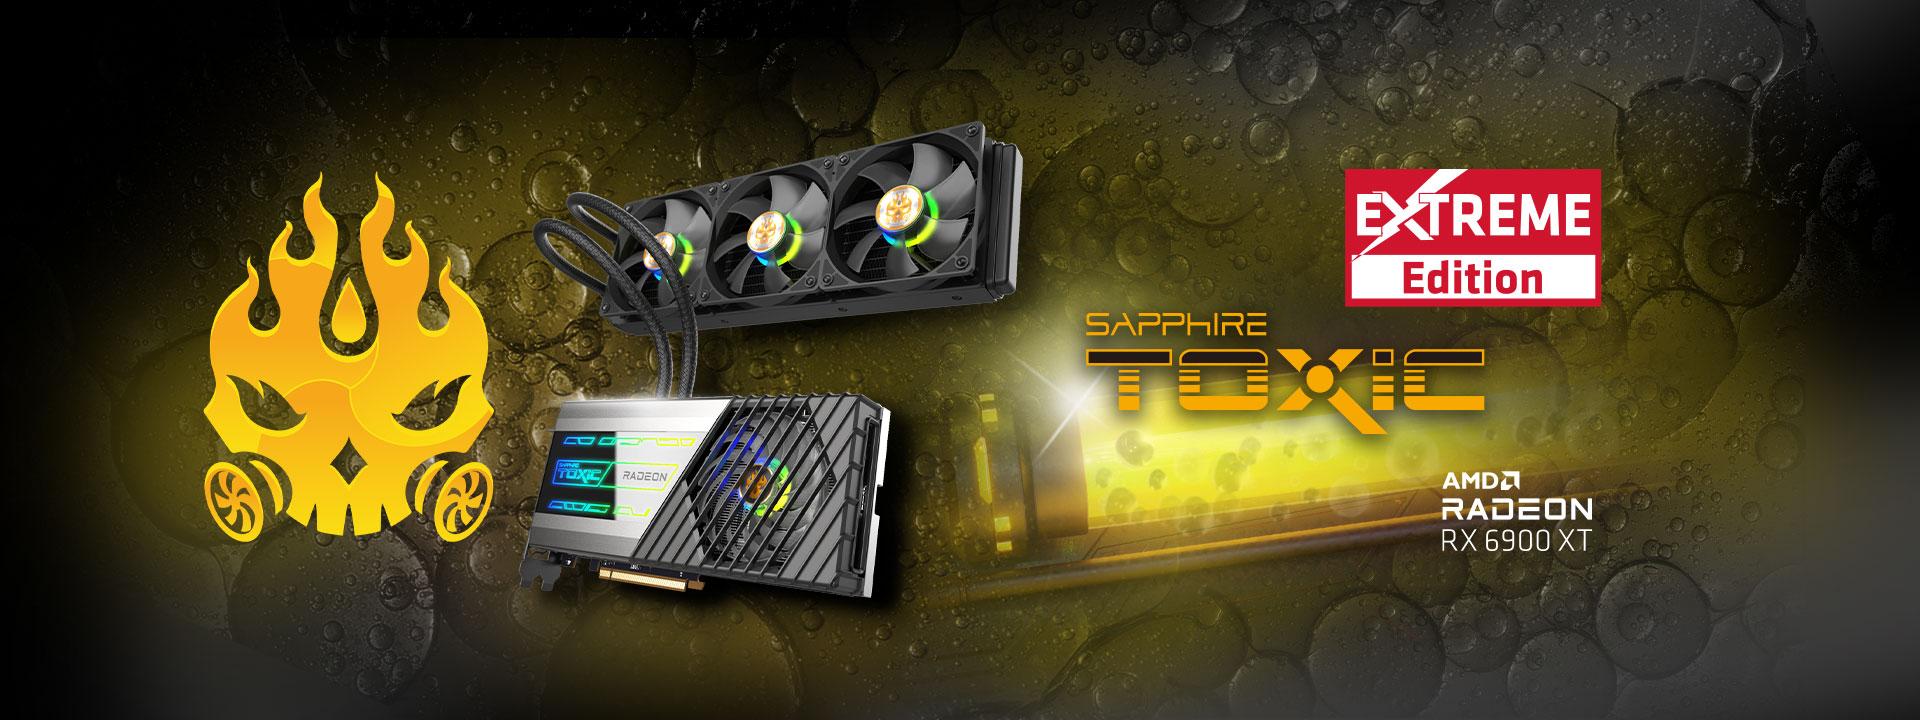 Sapphire Meluncurkan Radeon RX 6900 XT TOXIC Extreme Edition Graphics Card Dengan Overclock Lebih dari 2,7 GHz